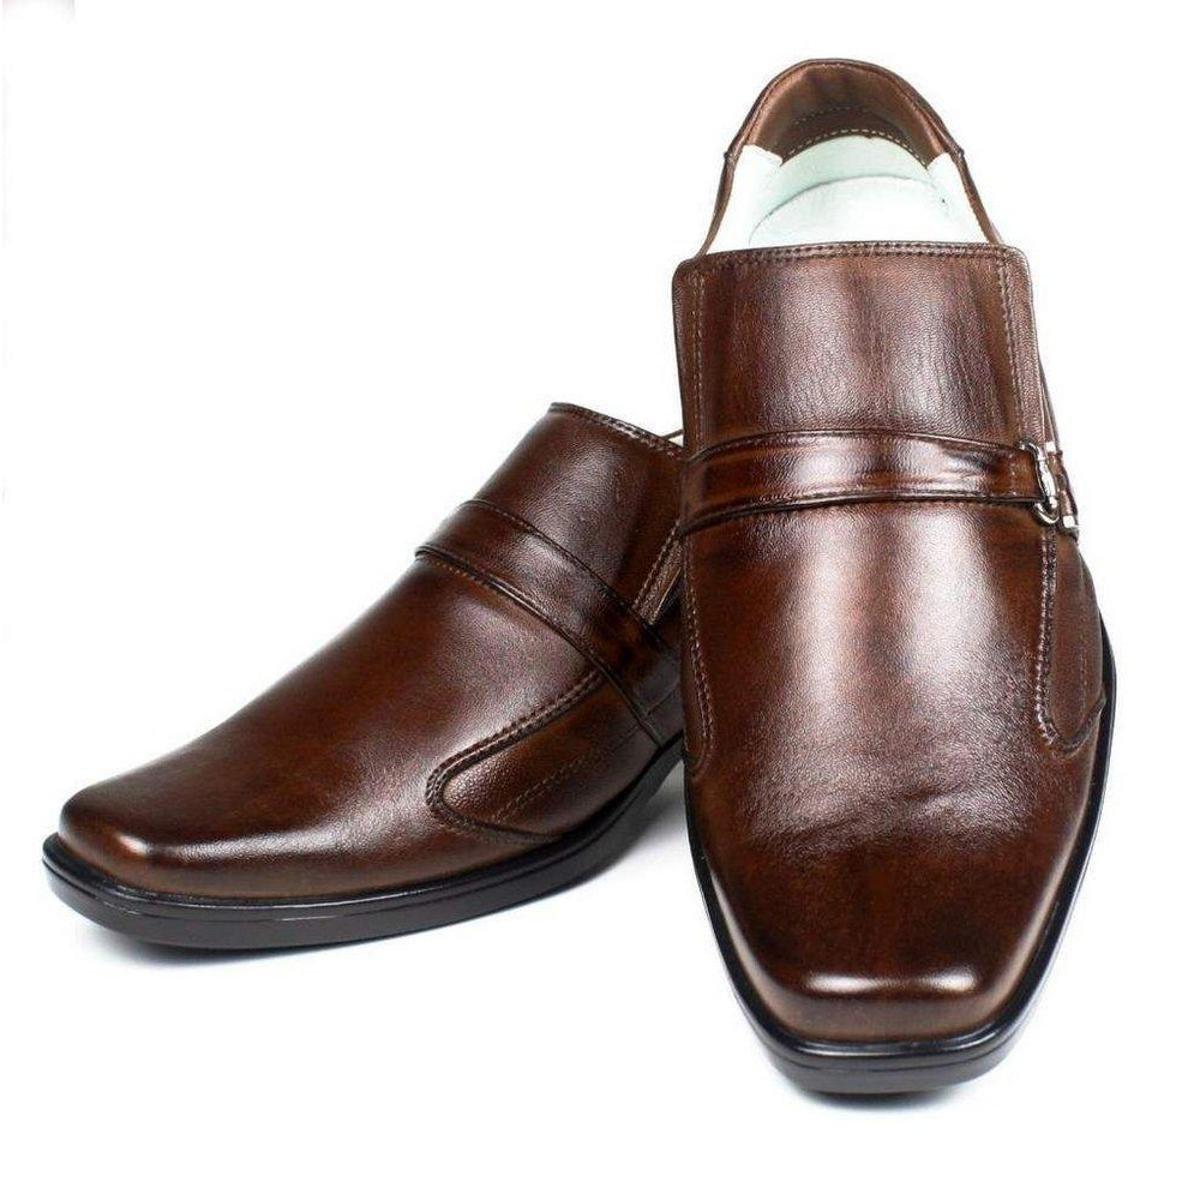 Sapato Marrom Confortável Ranster Escuro Couro Sapato Gel Ranster Palmilha Confortável 5Zgfwf